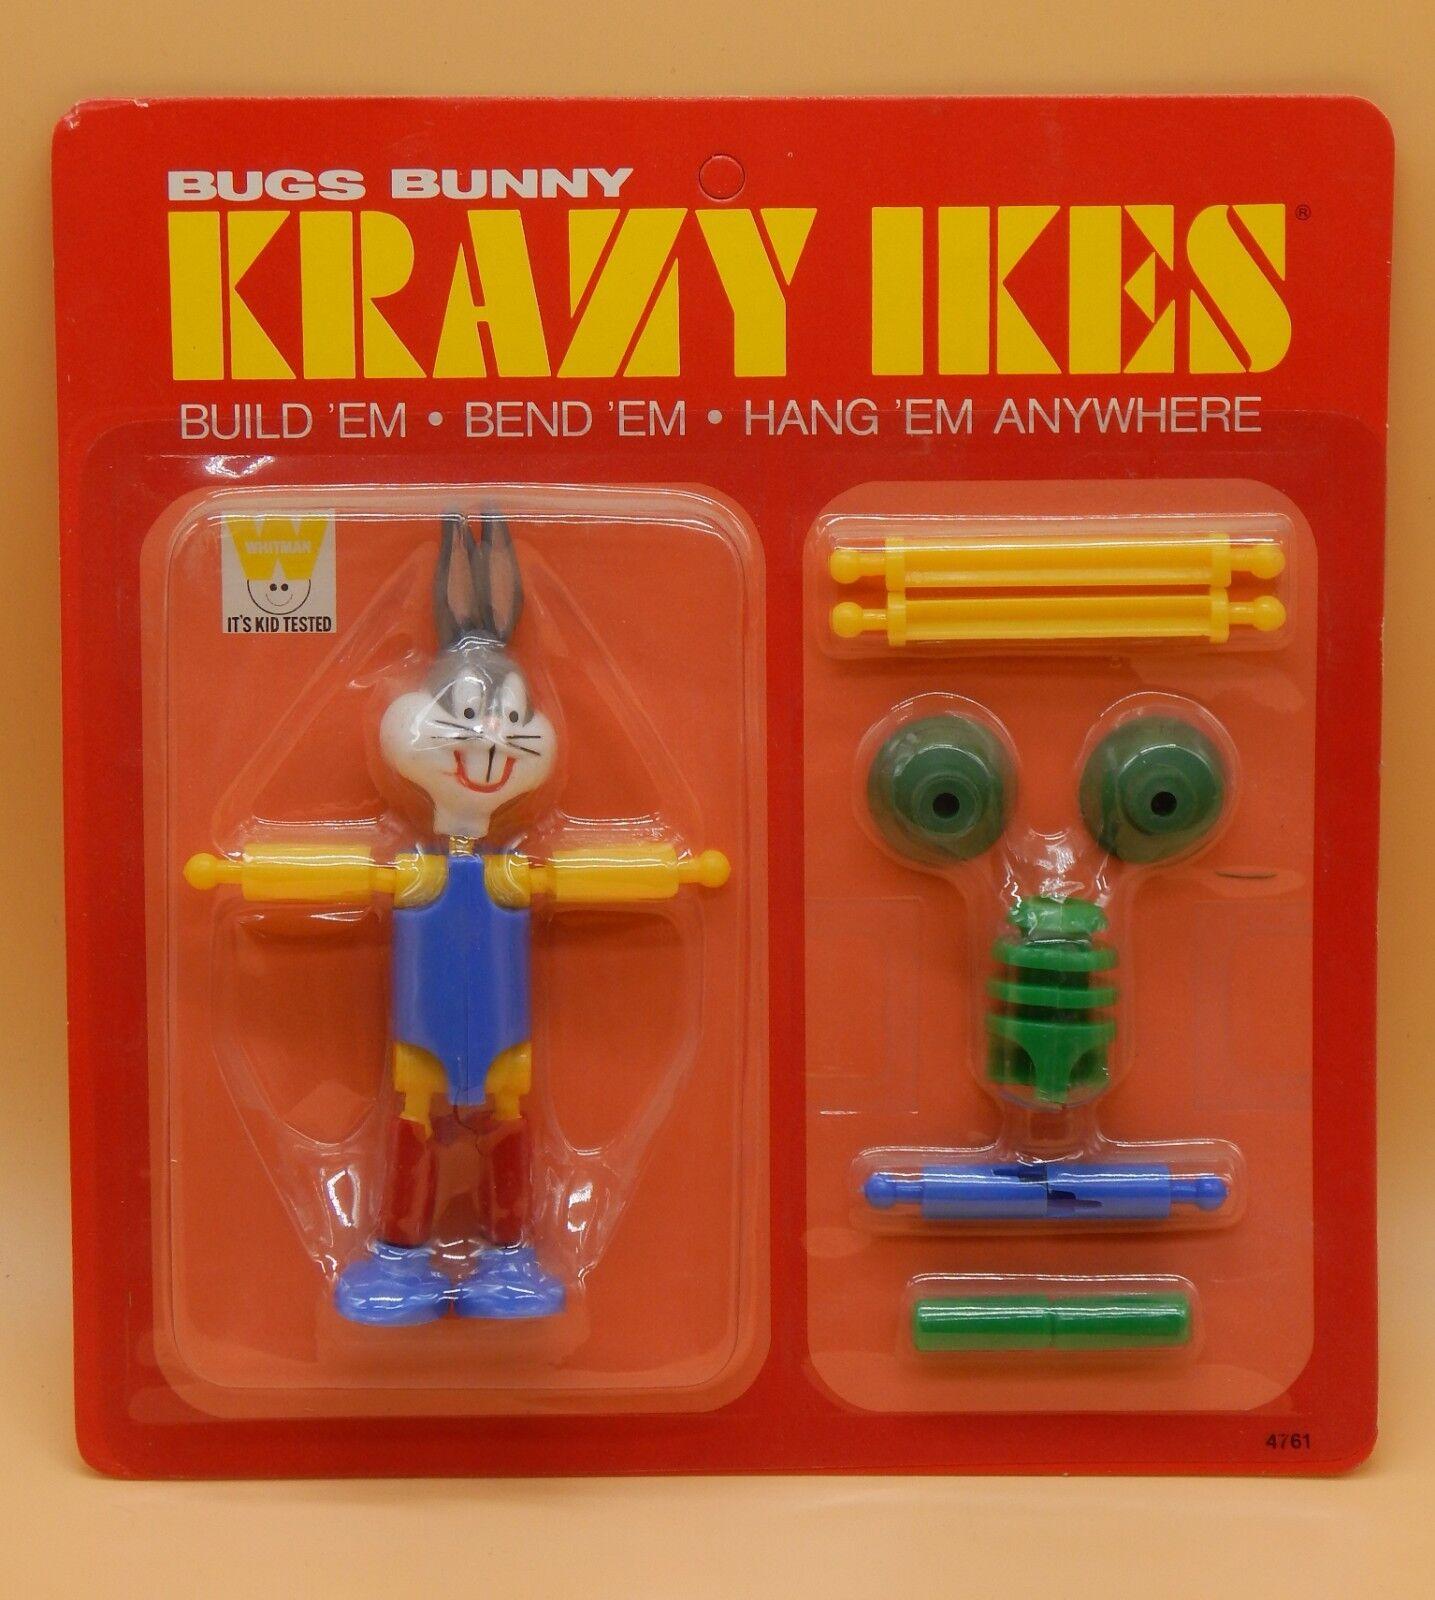 1960 ist jahrgang whitman verrckt ikes bugs - bunny - actionfigur versiegelt moc spielzeug selten